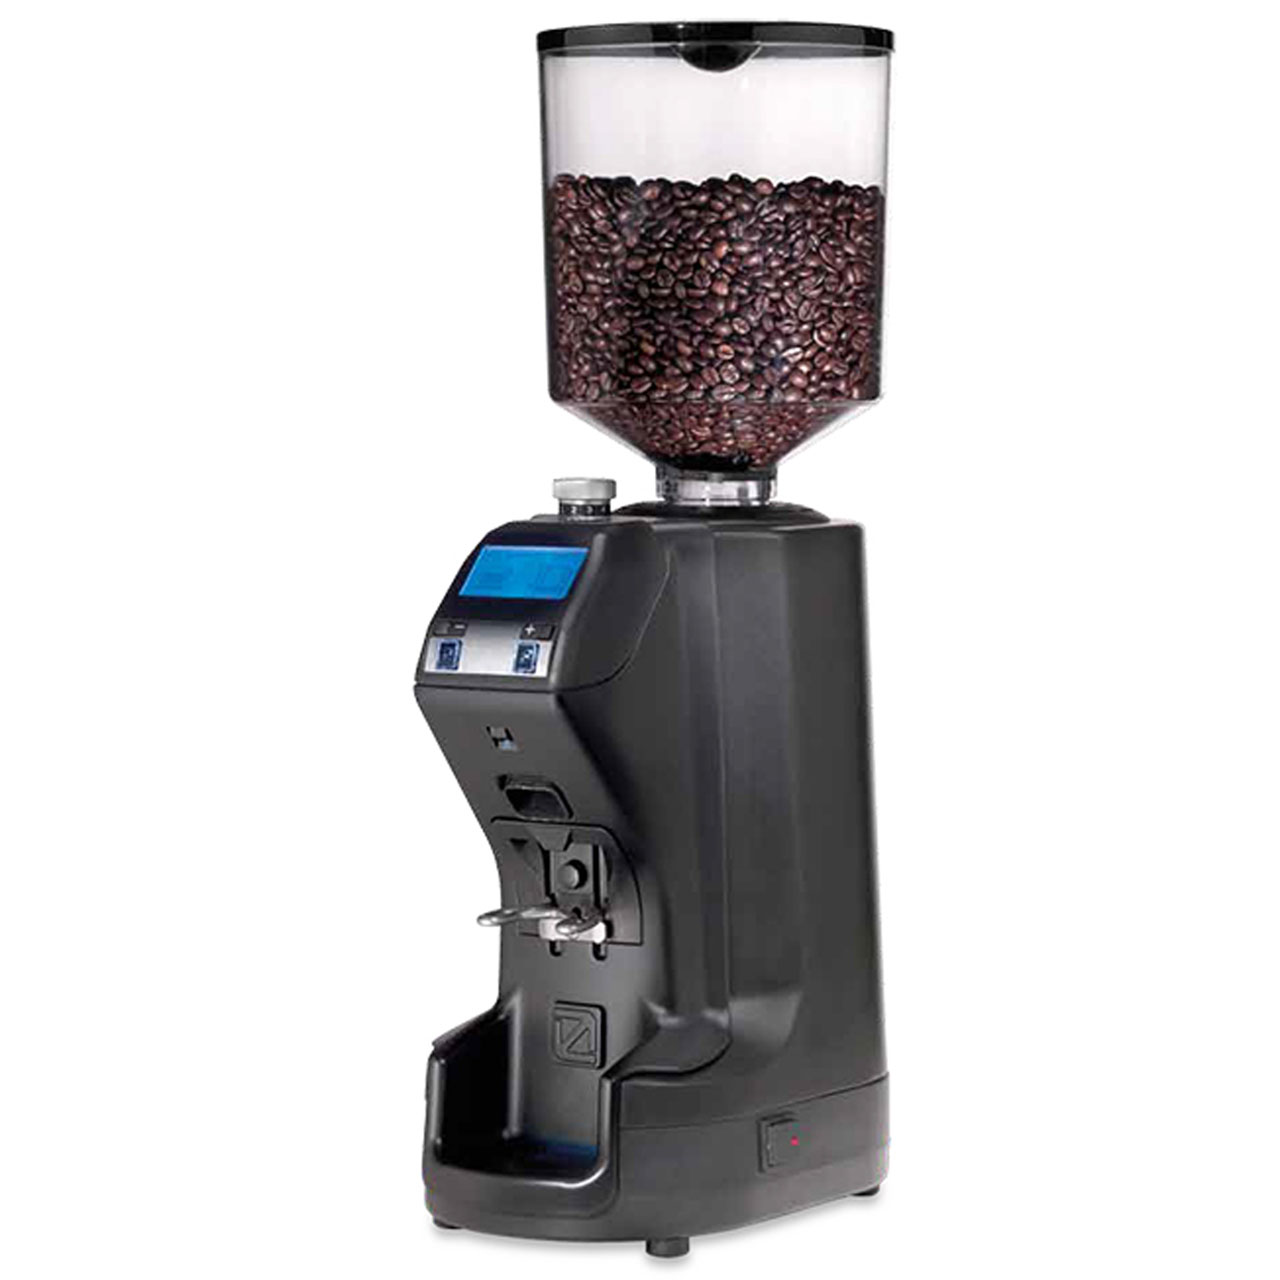 Кофемолка для кофемашины Nuova Simonelli MDX On Demand